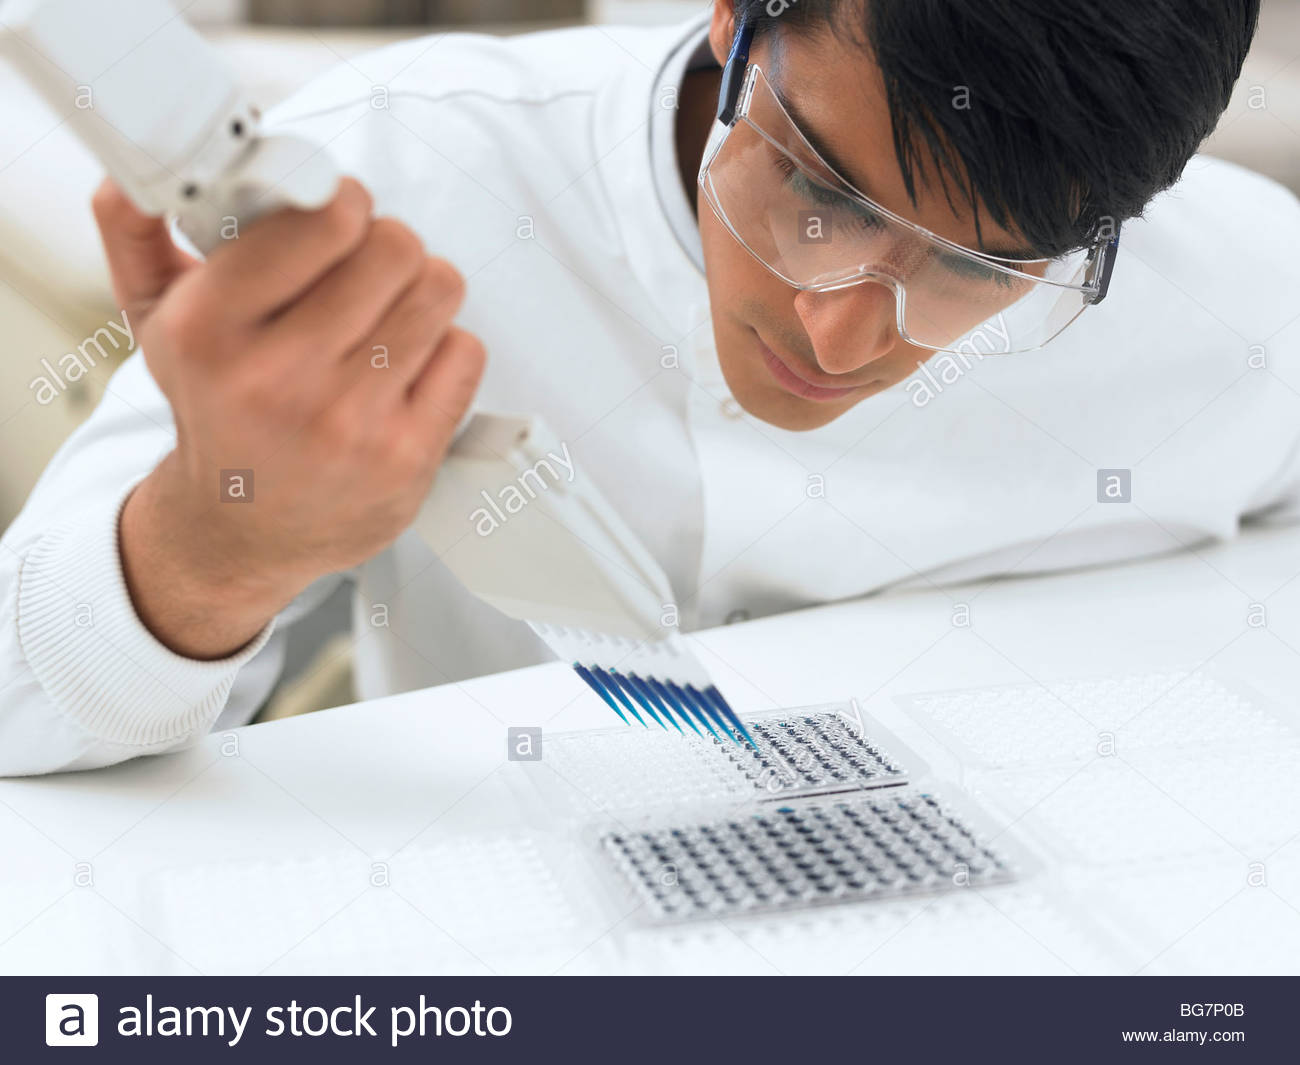 Scientist dropping liquid dans le bac Photo Stock